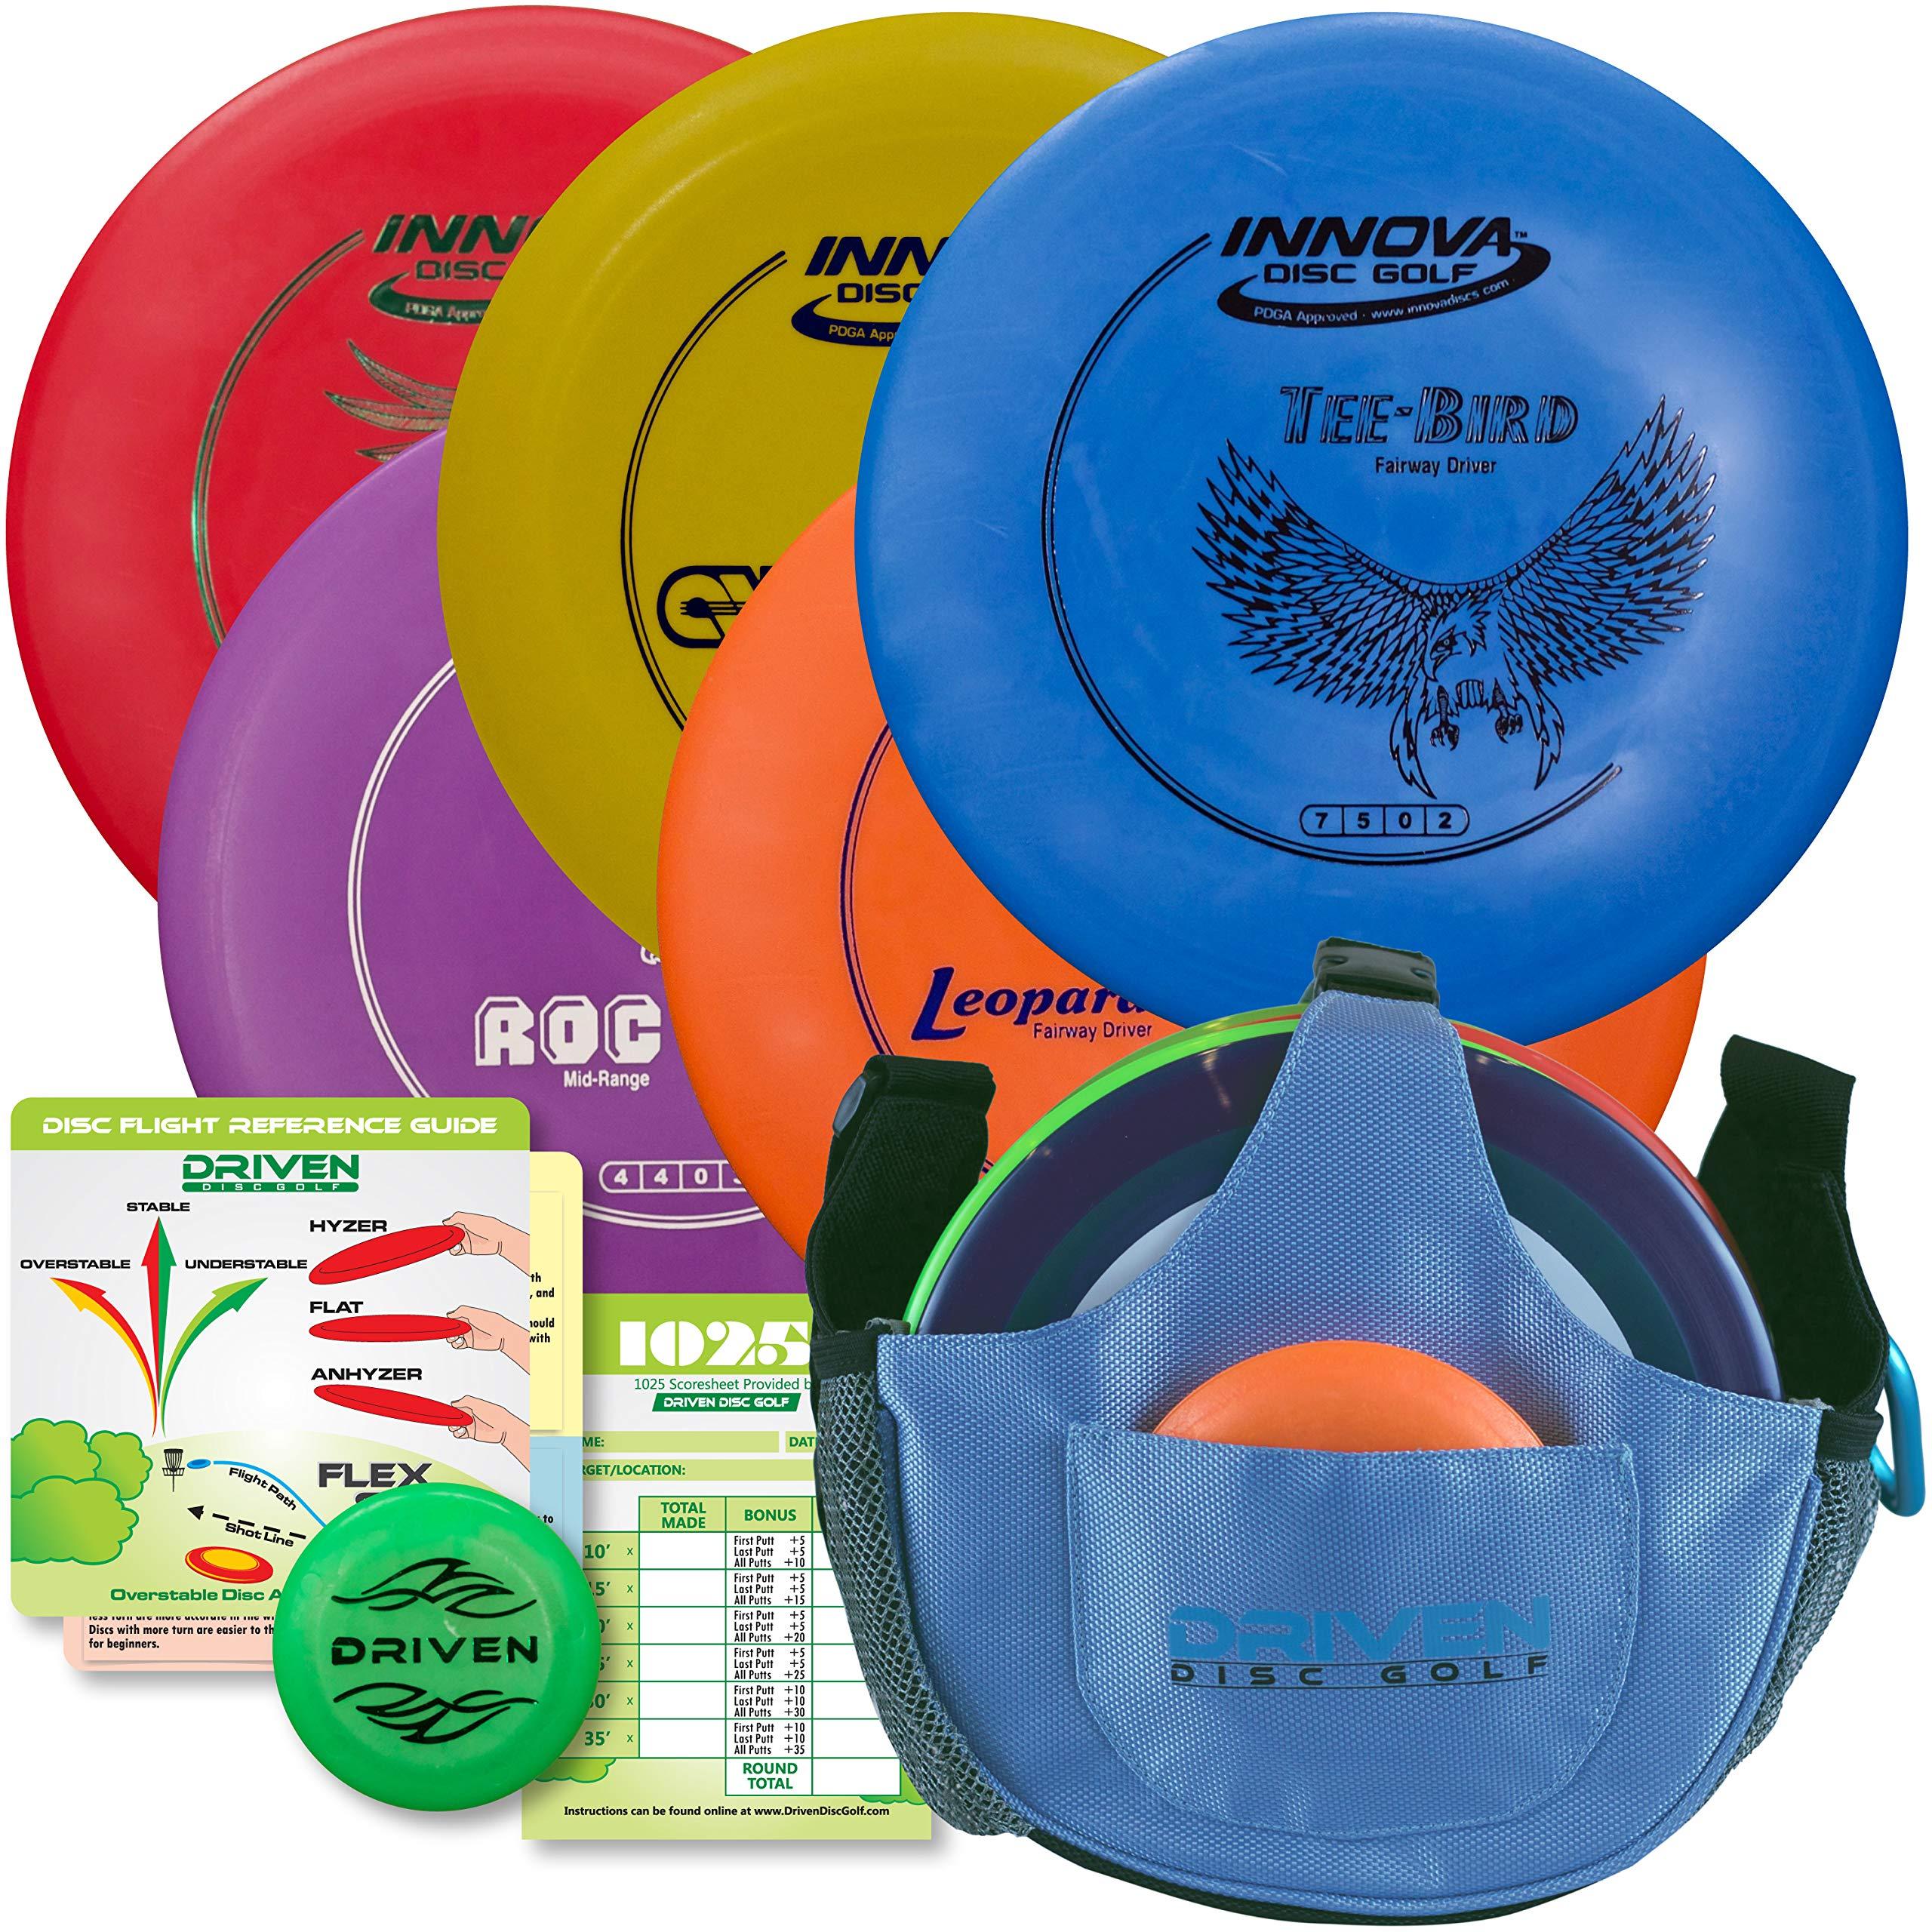 Driven Disc Golf Starter Set - 5 Disc Set with Bag by Driven Disc Golf